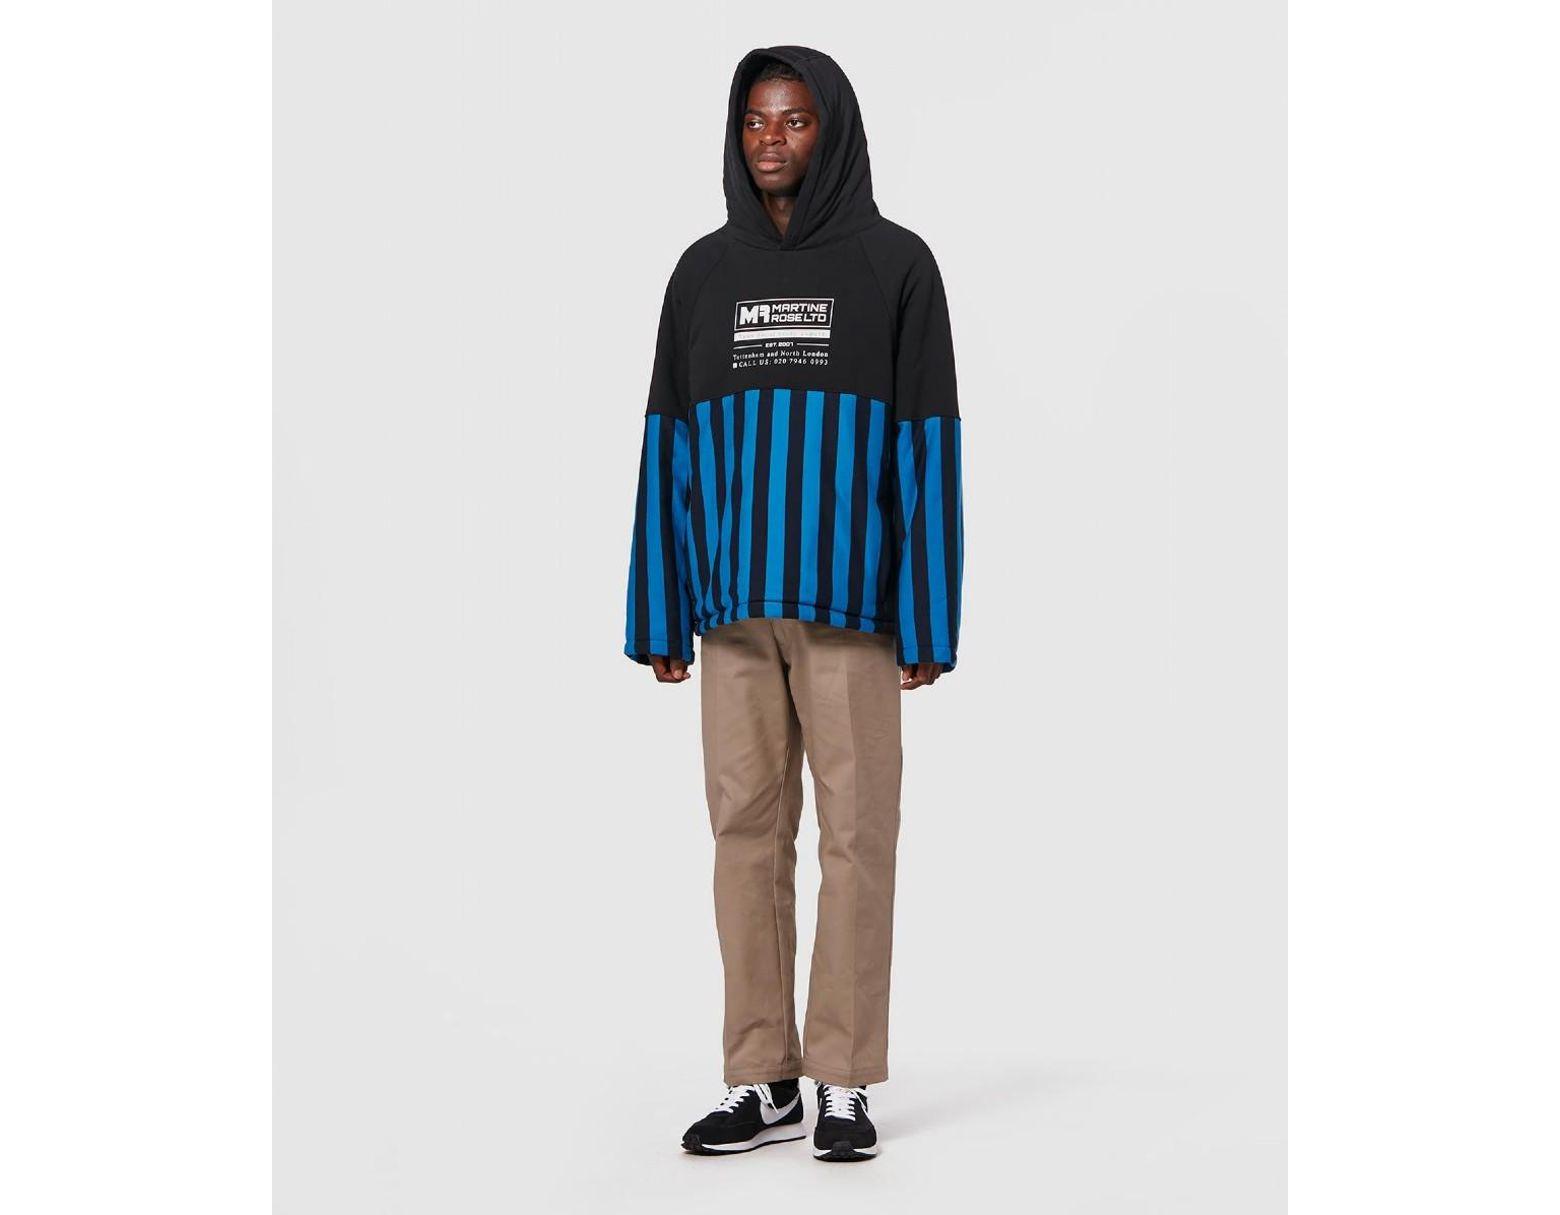 9fa2169e4 Martine Rose Split Wadded Hooded Sweatshirt in Blue for Men - Save 52% -  Lyst